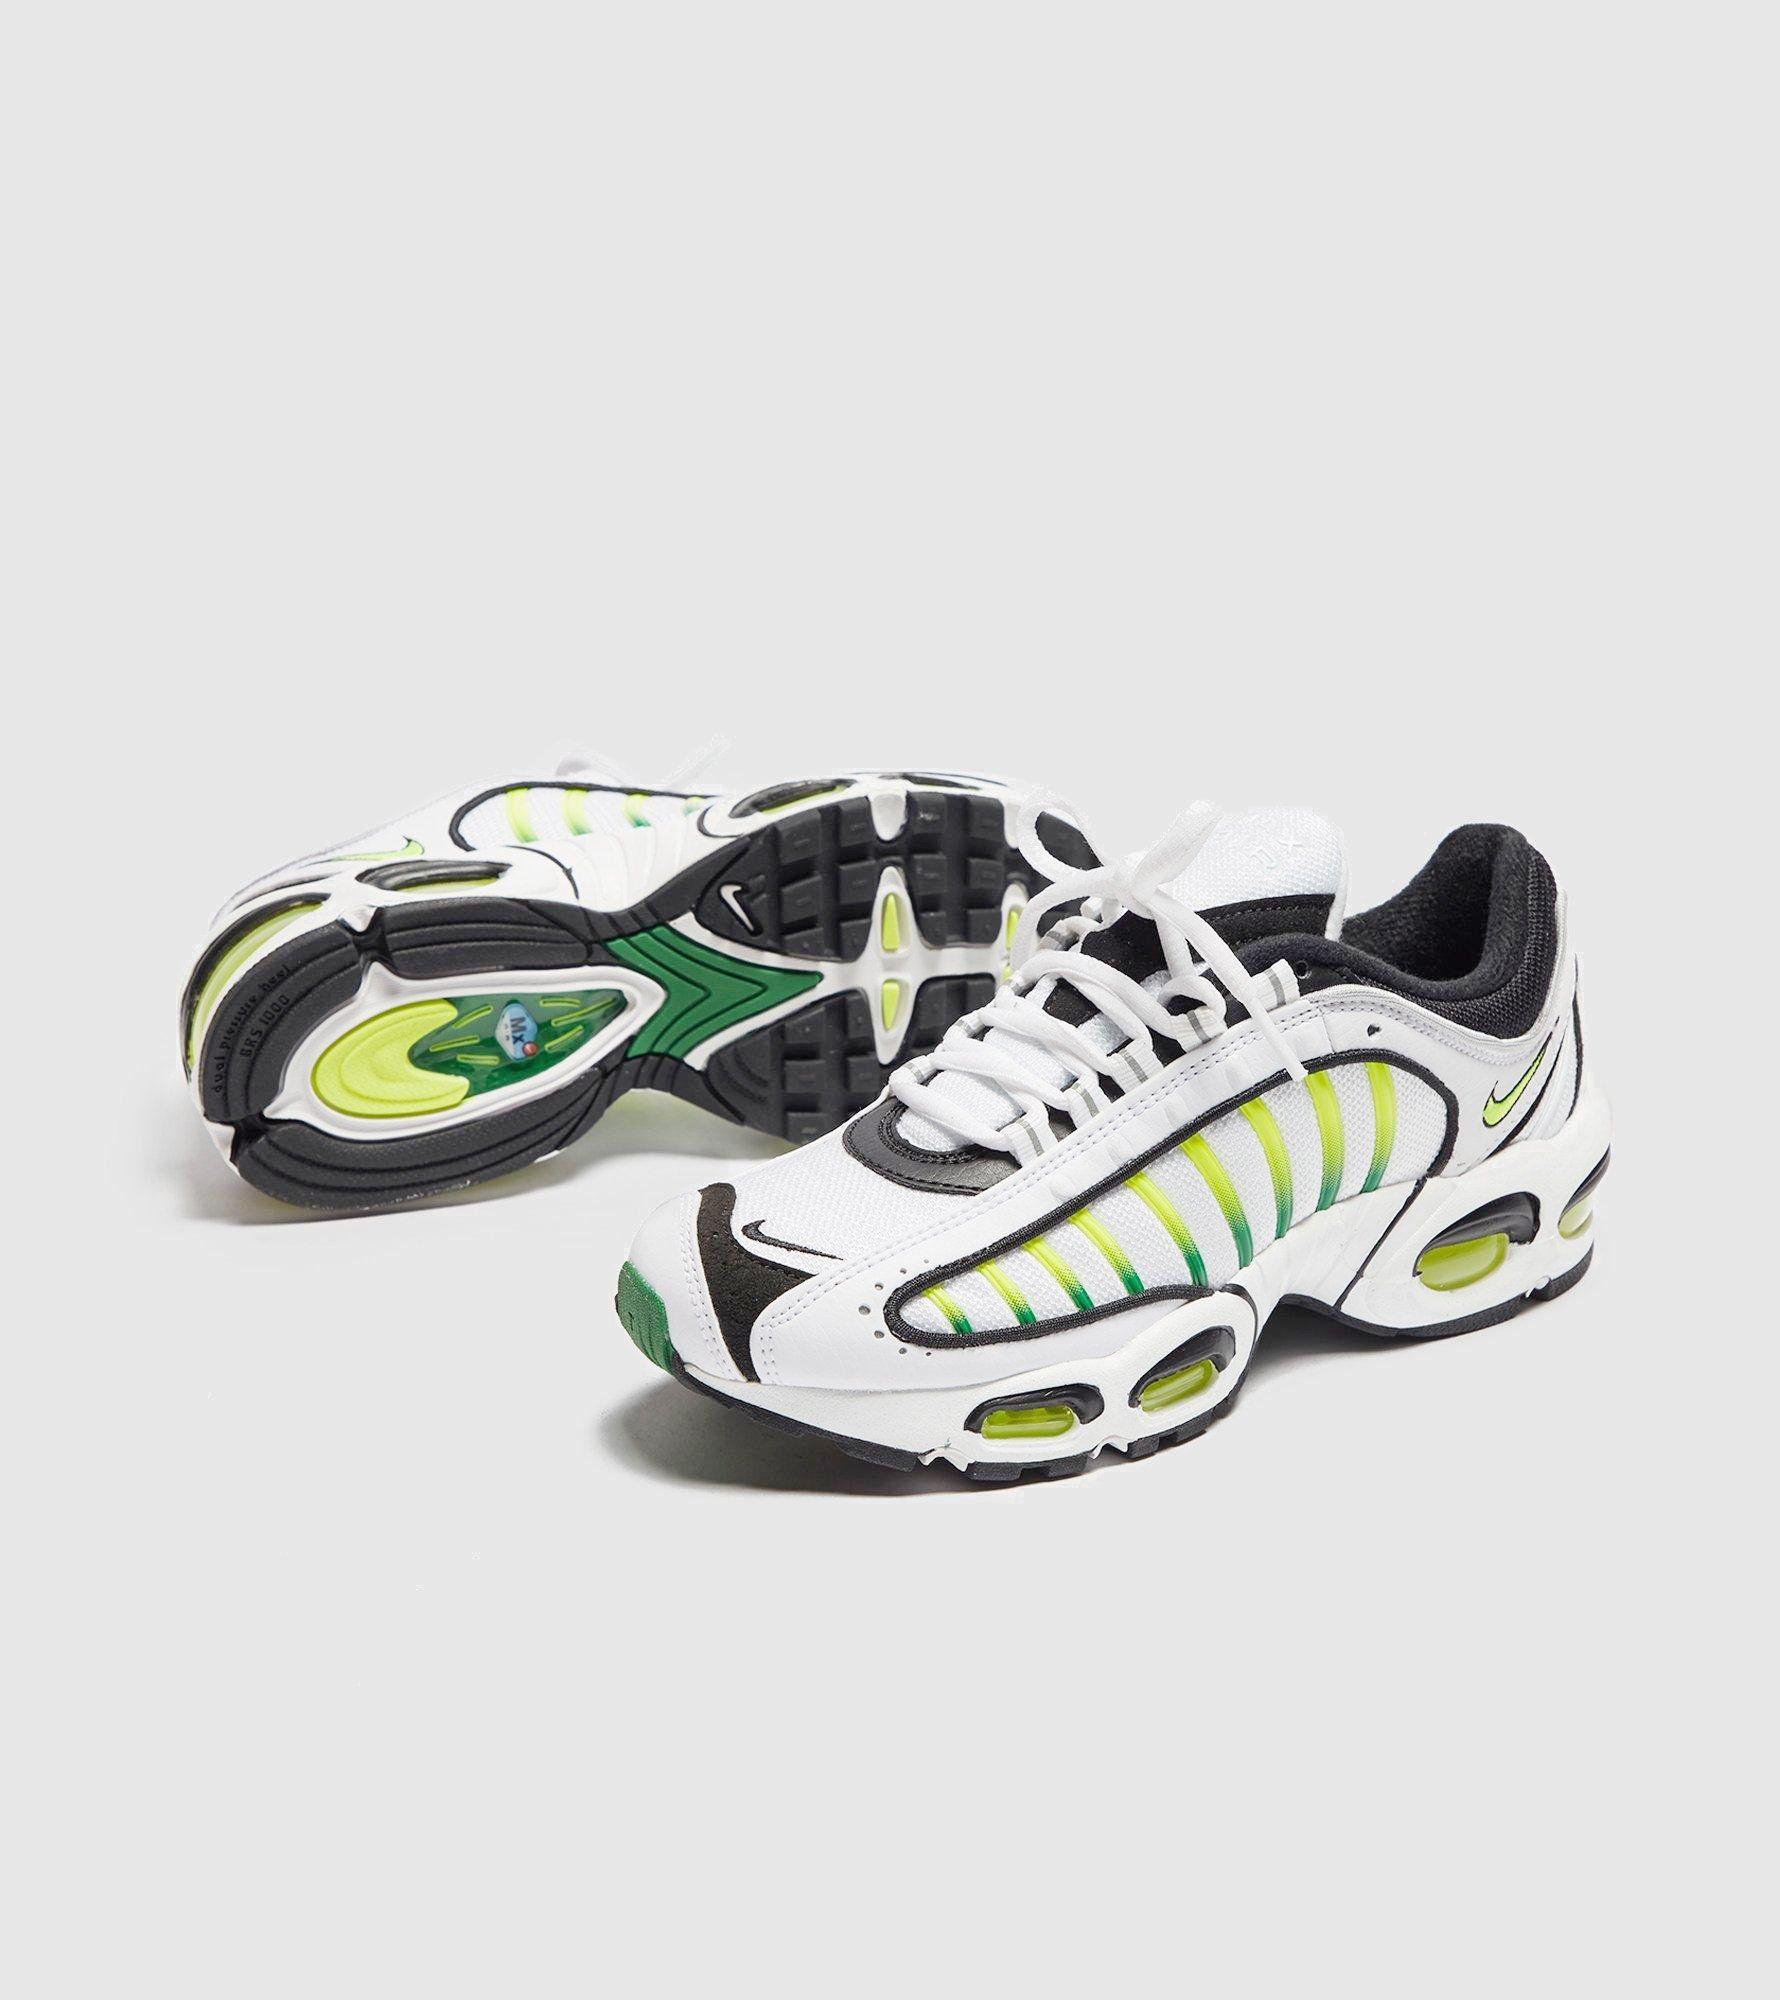 Nike Air Max Tailwind 4 Women's